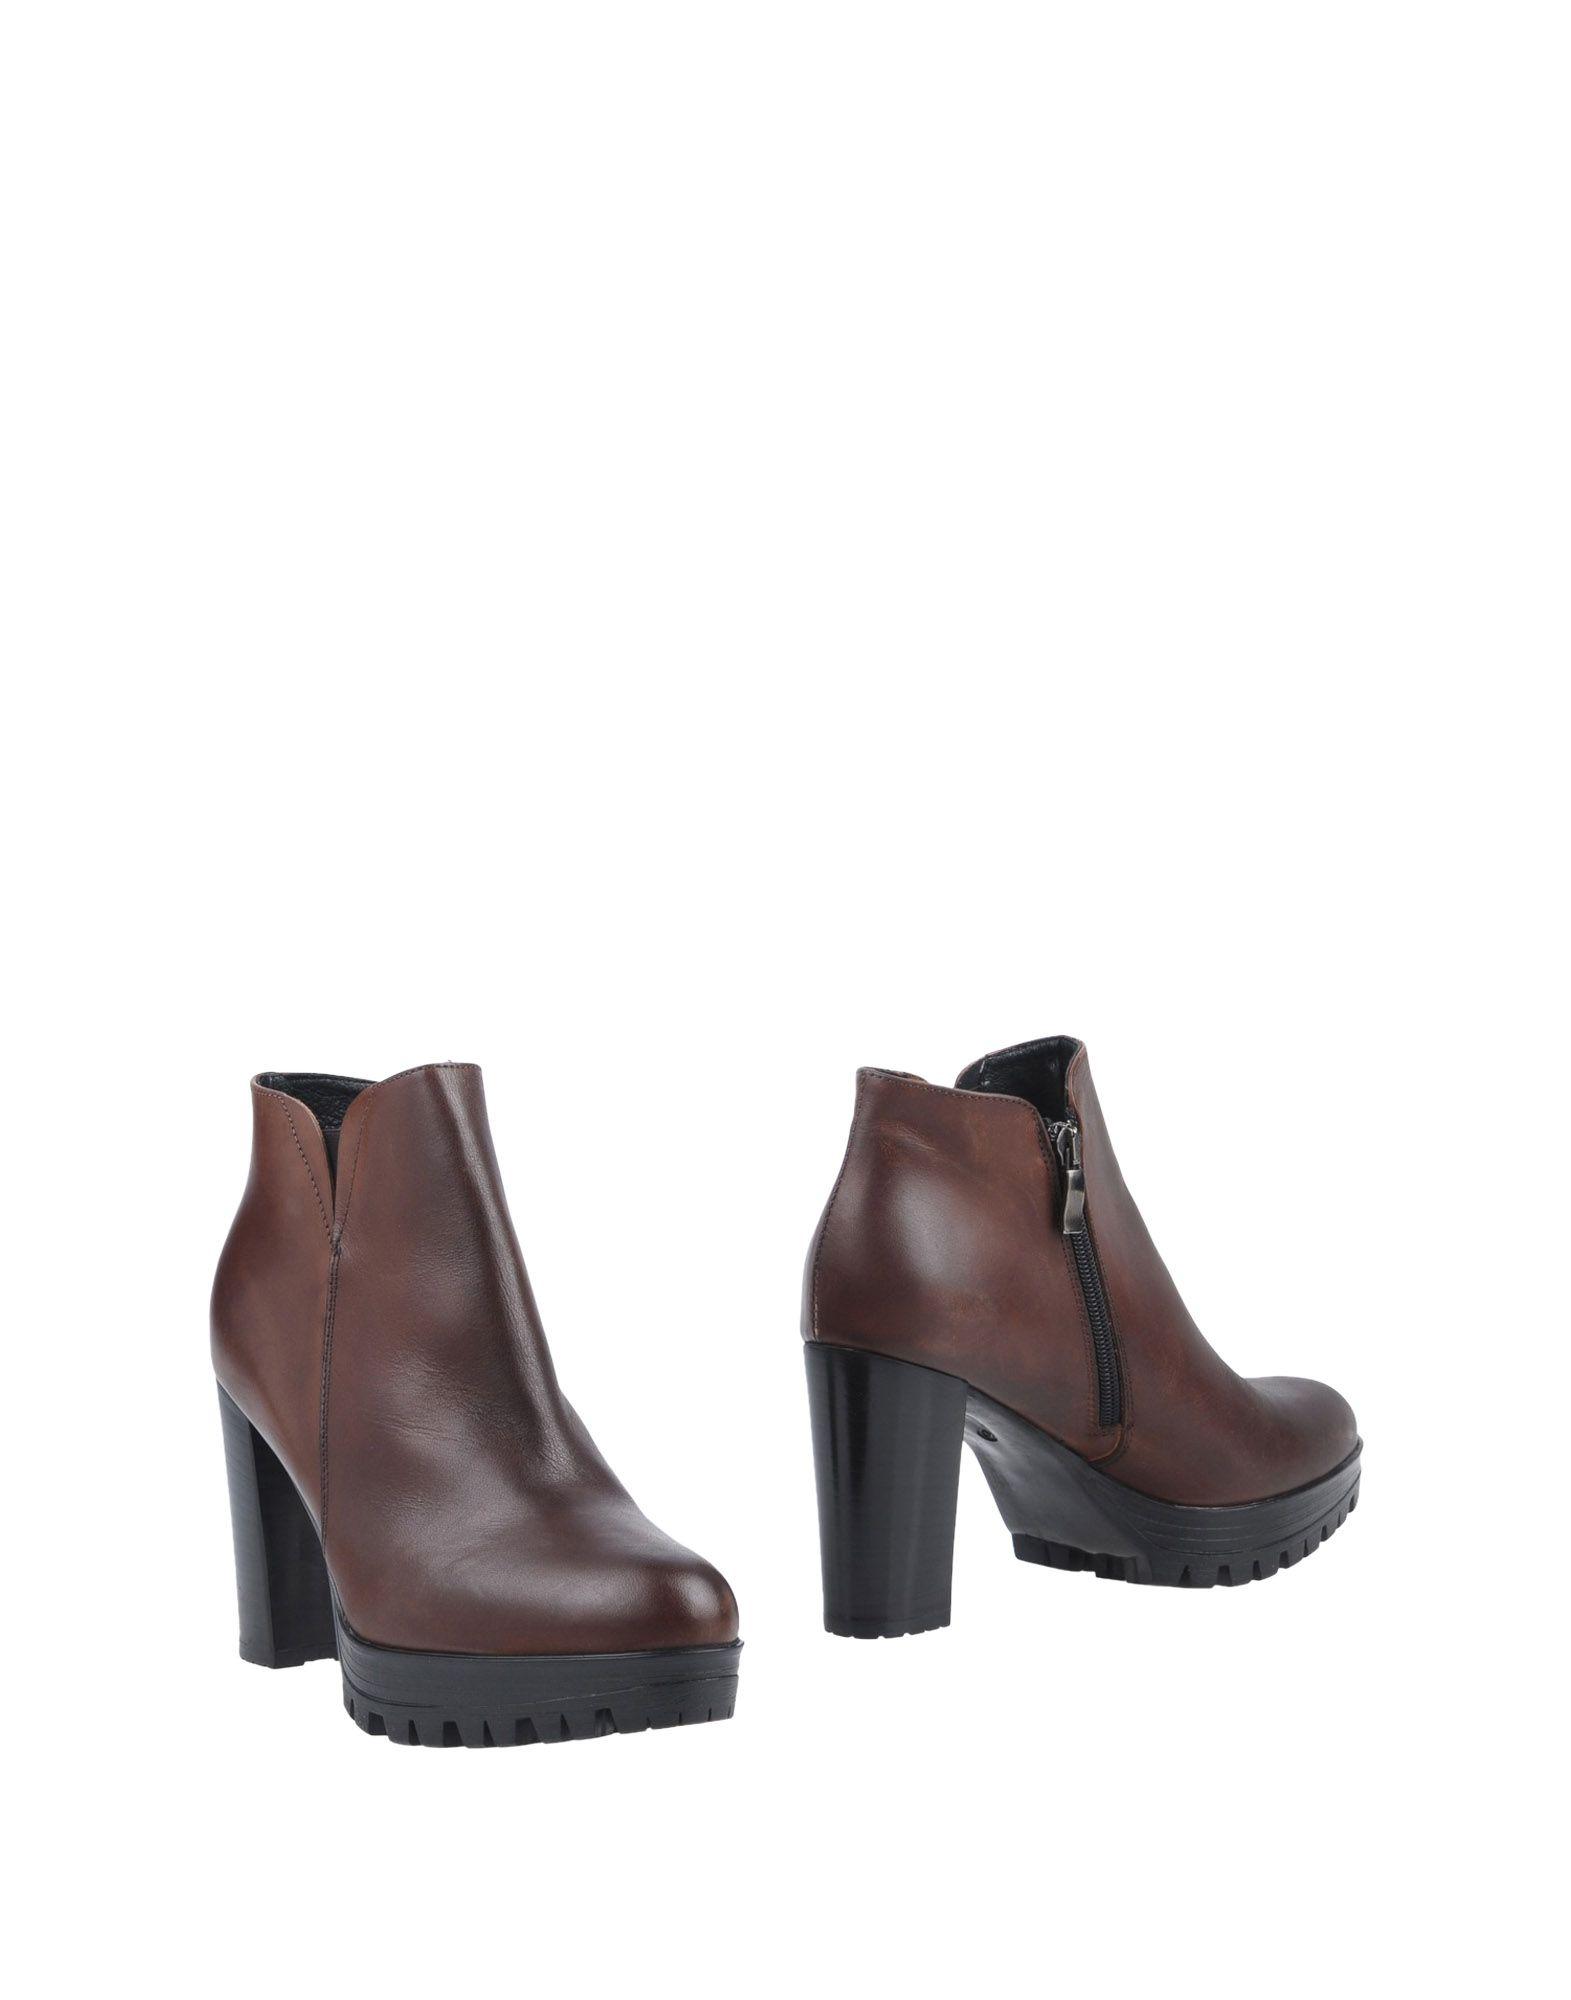 Stivaletti A&M Collection Donna - 11317173SC 11317173SC - 4aae07